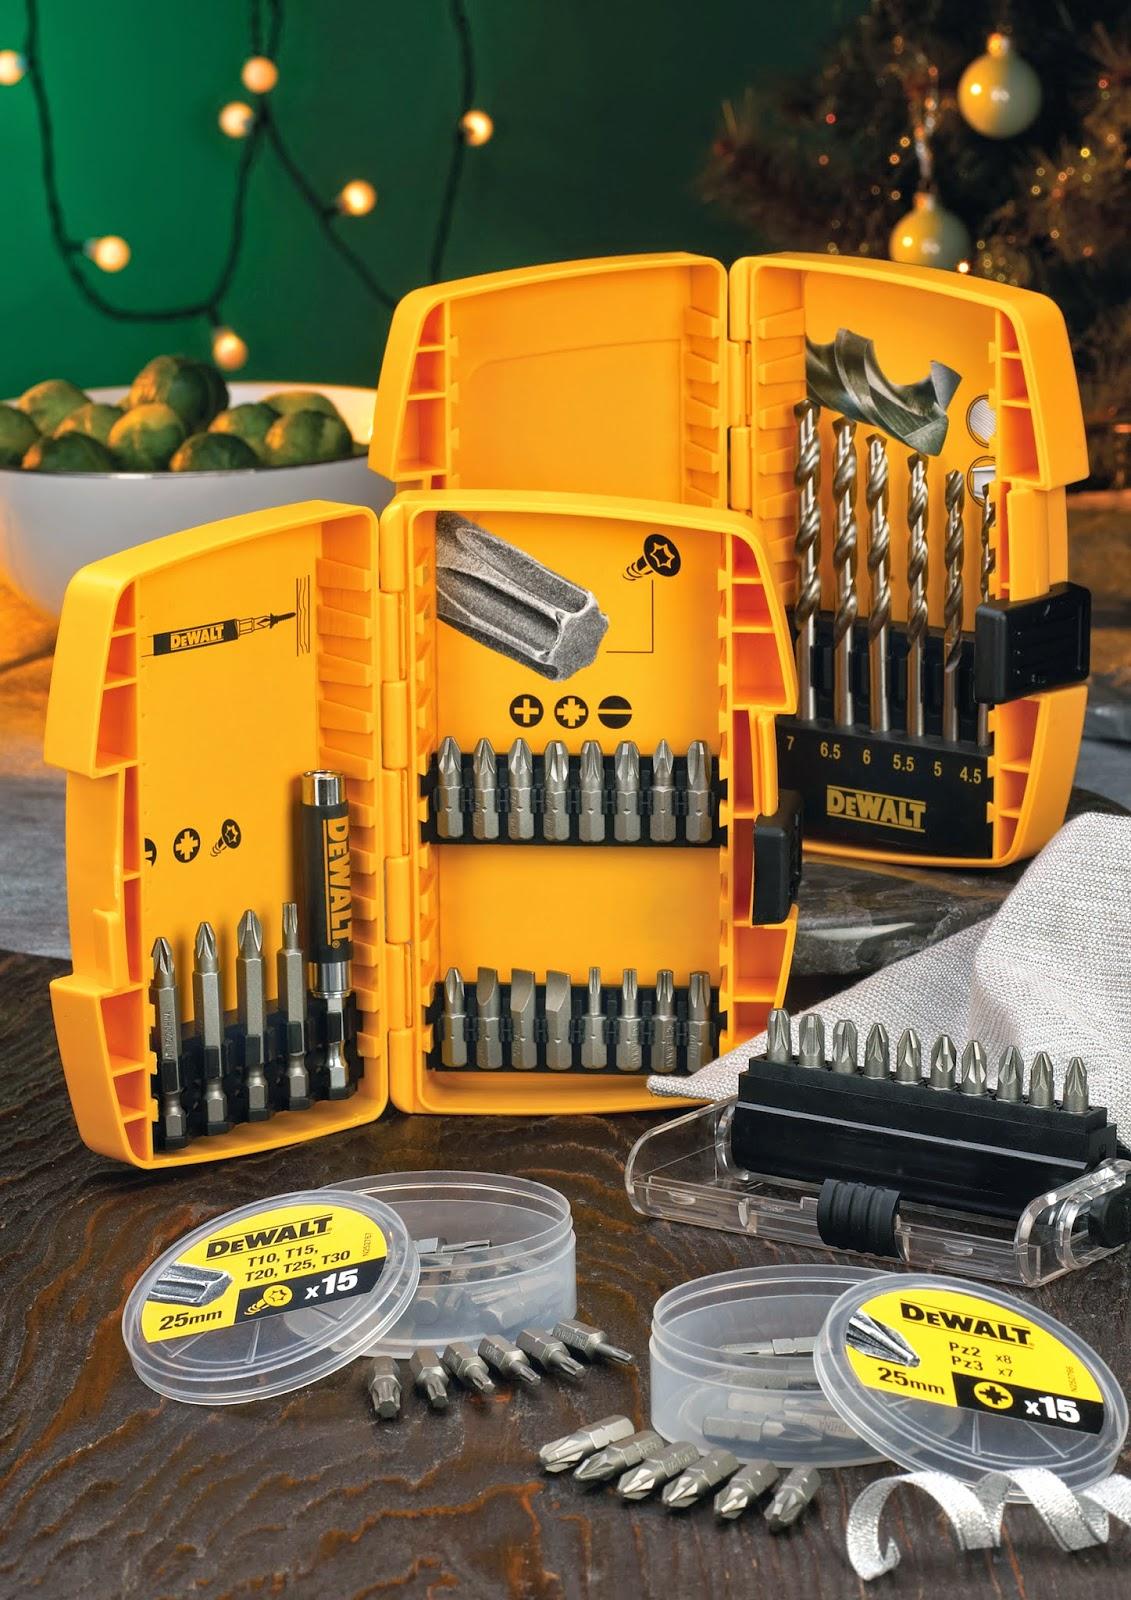 http://www.beesleyandfildes.co.uk/dewalt-67-piece-drilling-and-screwdriving-set-ref-xms14mixset/